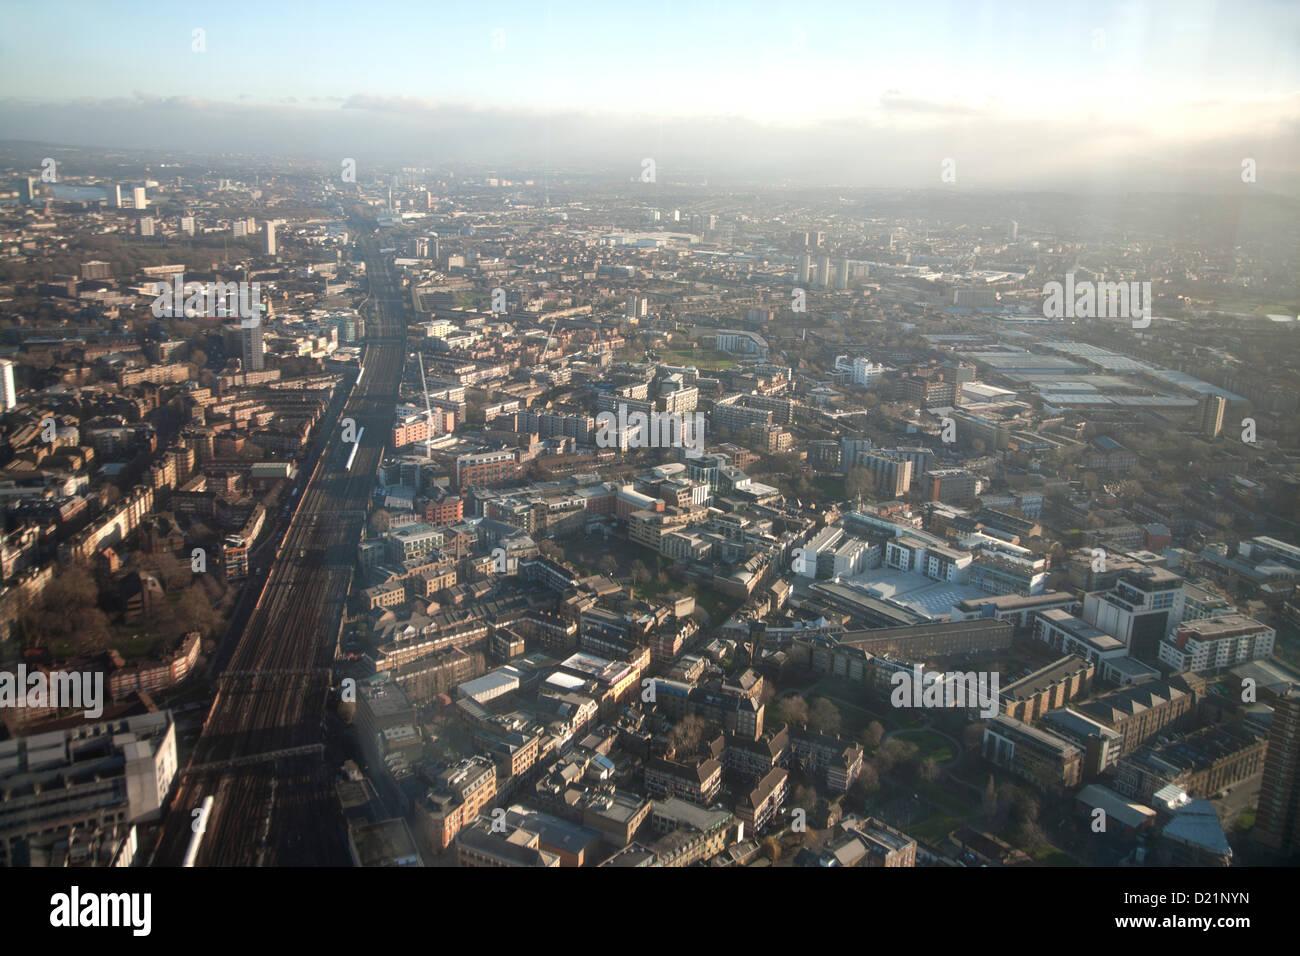 London, UK. The View from the Shard, towards Bermondsey including, the River Thames, railtracks leaving London Bridge - Stock Image